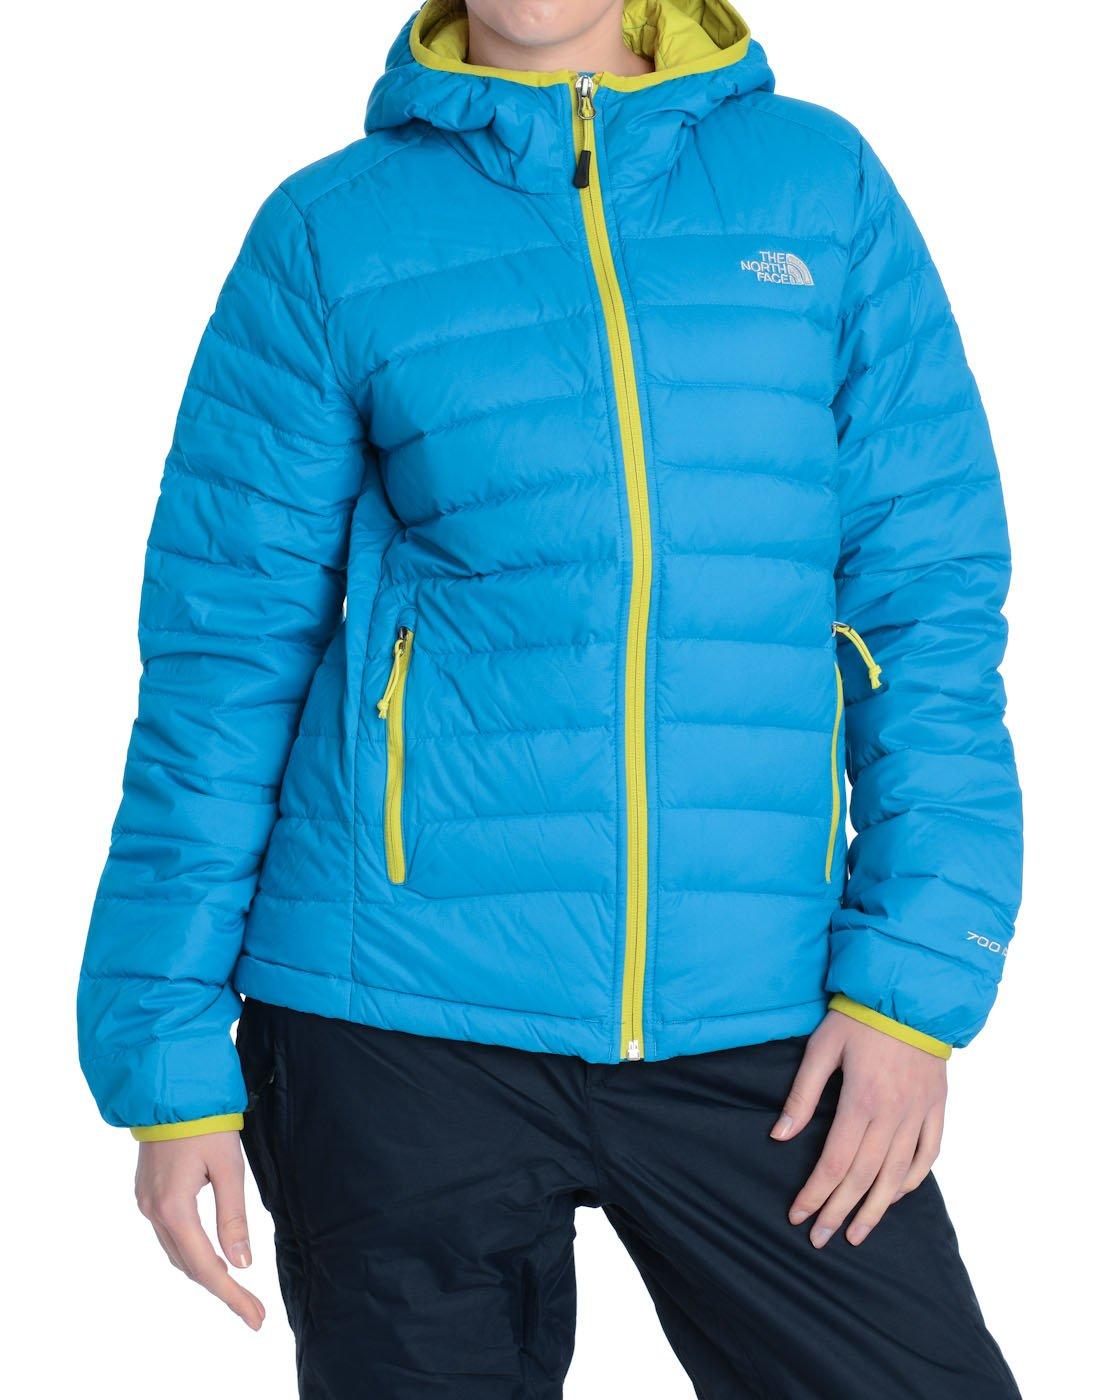 Damen Snowboard Jacke The North Face Imbabura Jacket jetzt bestellen